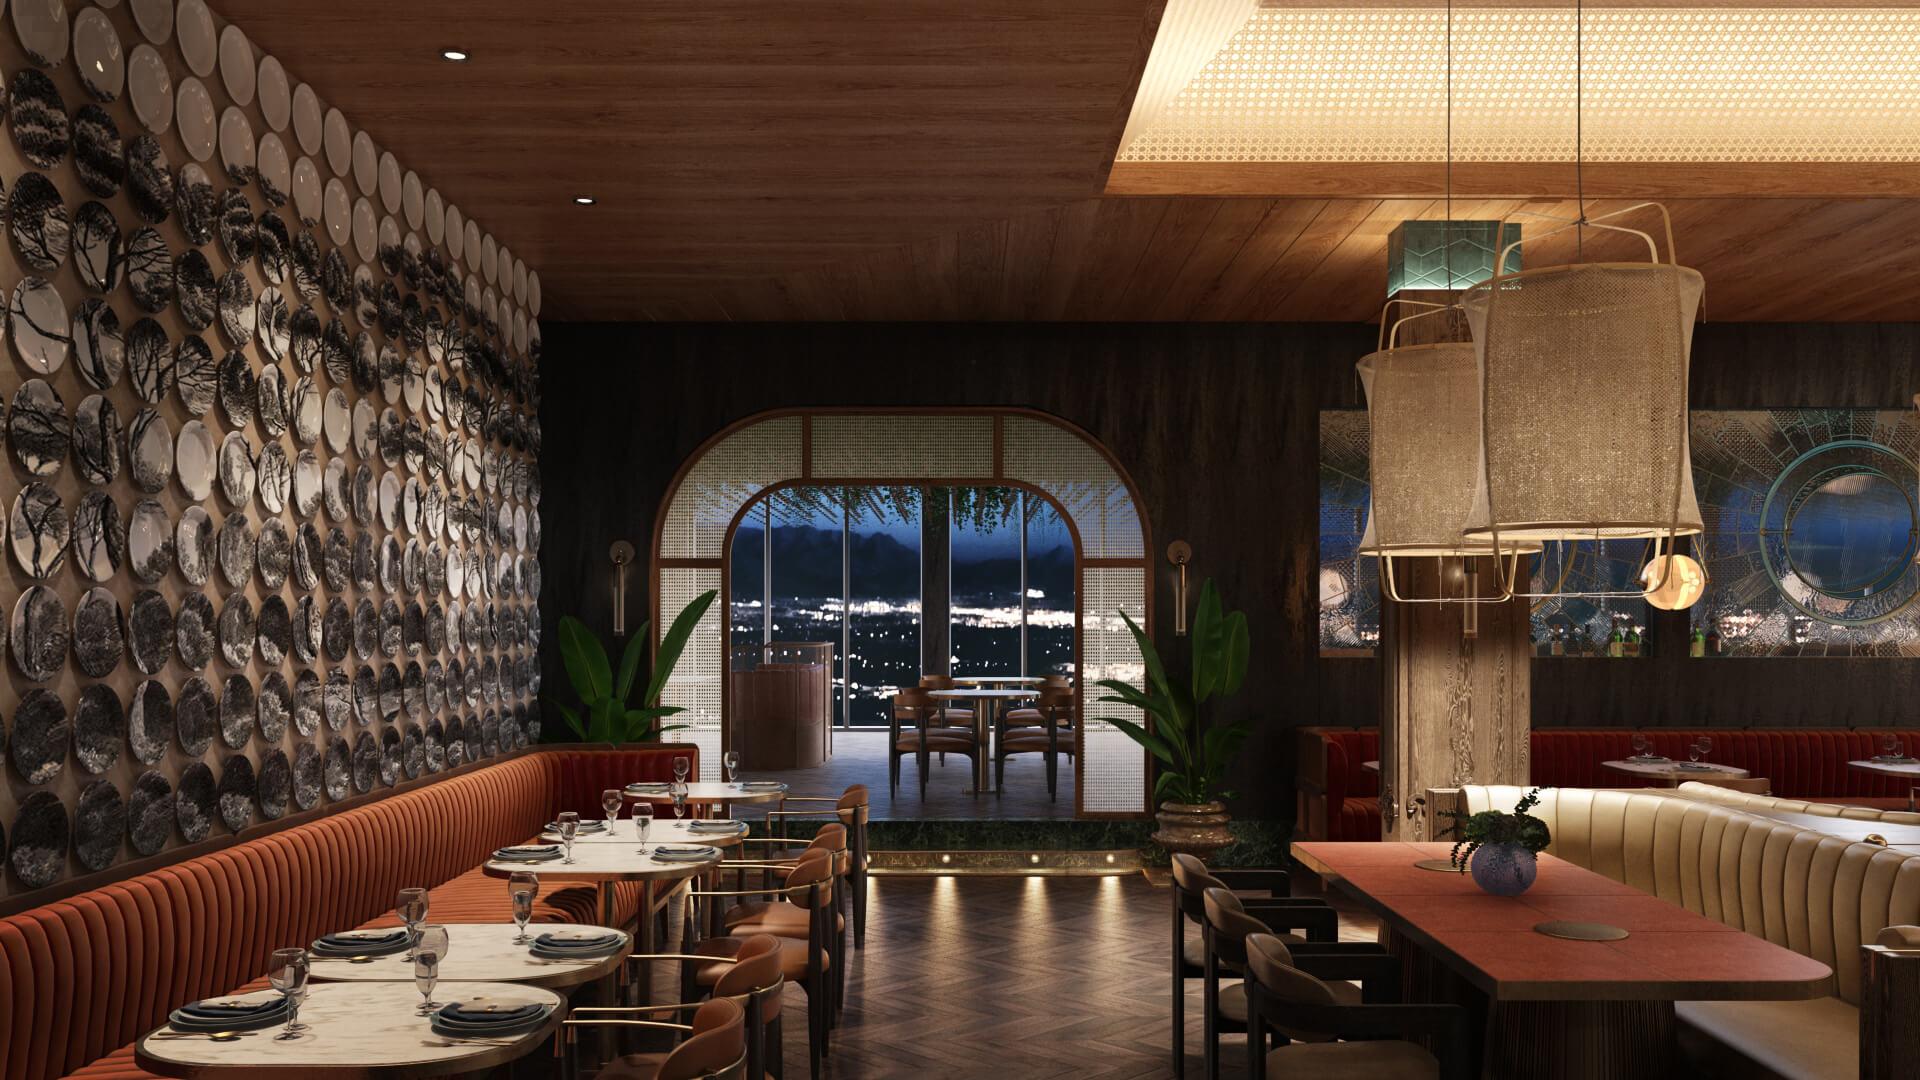 3D Visualization for a Restaurant Design